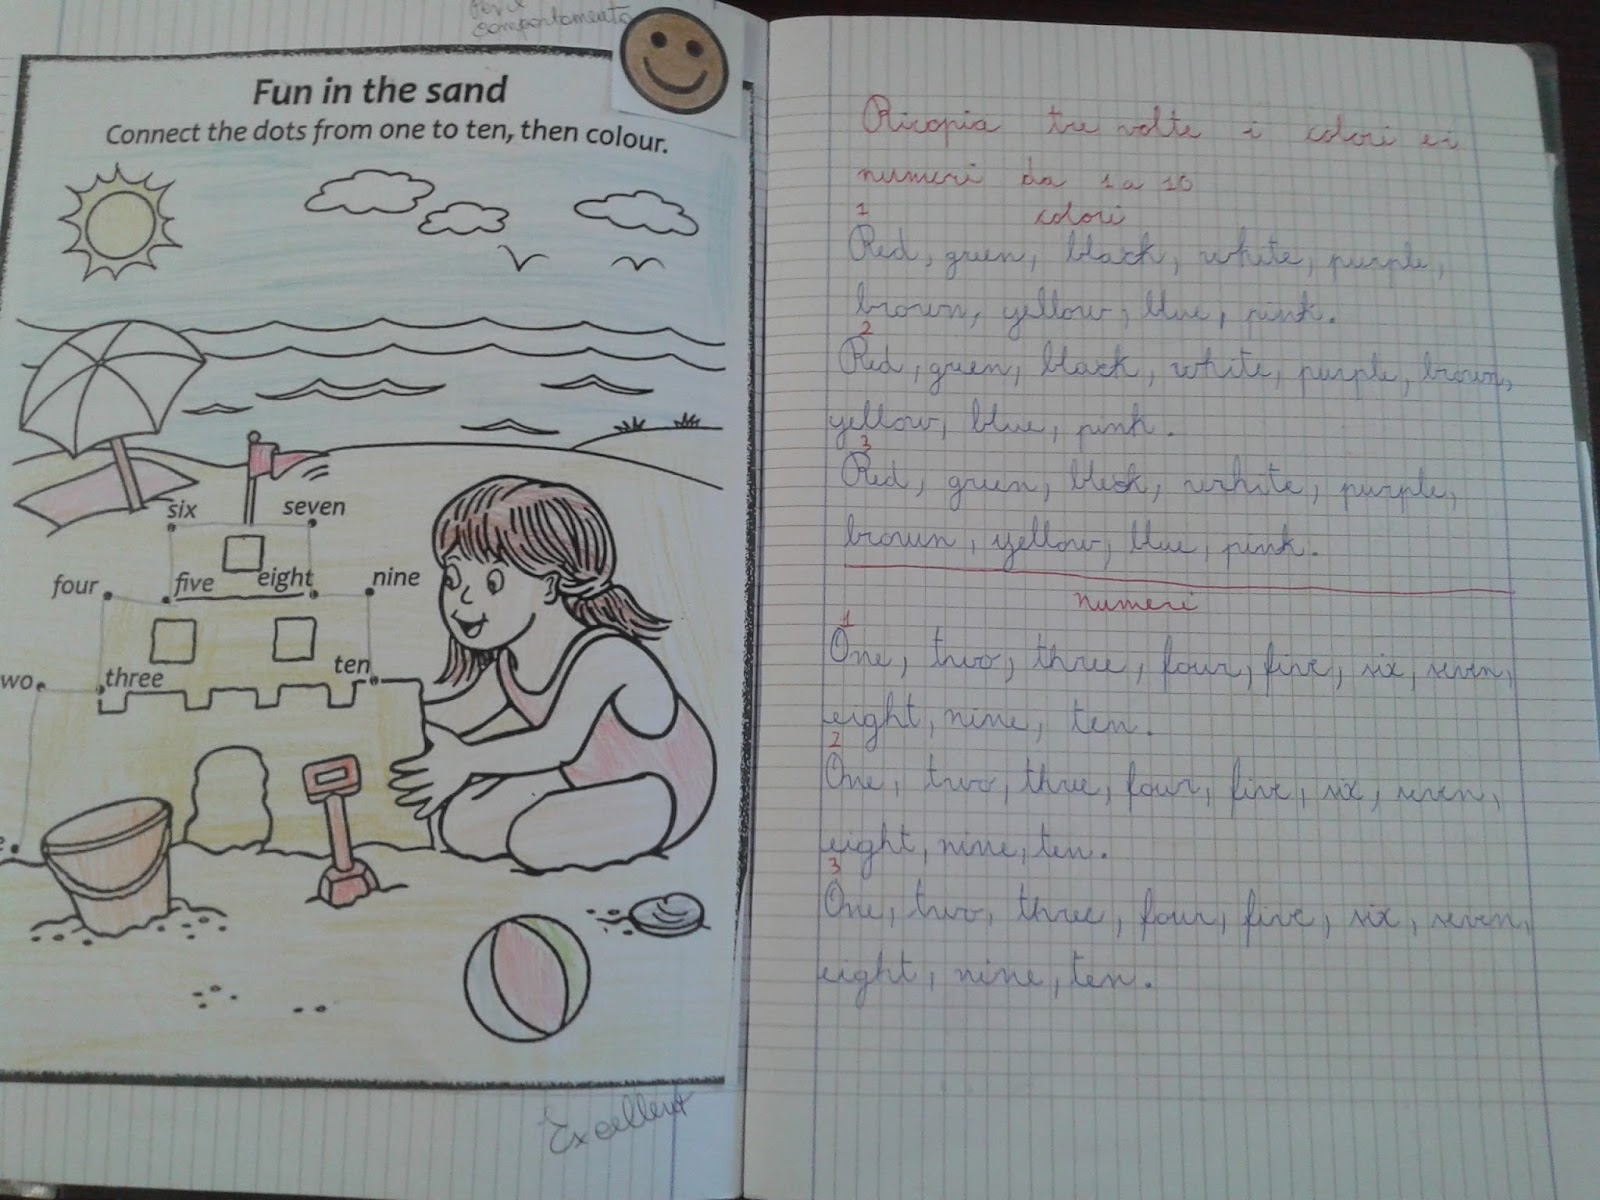 Extrêmement LA MAESTRA MARIA TI SALUTA: QUADERNO DI INGLESE CLASSE TERZA B KQ88